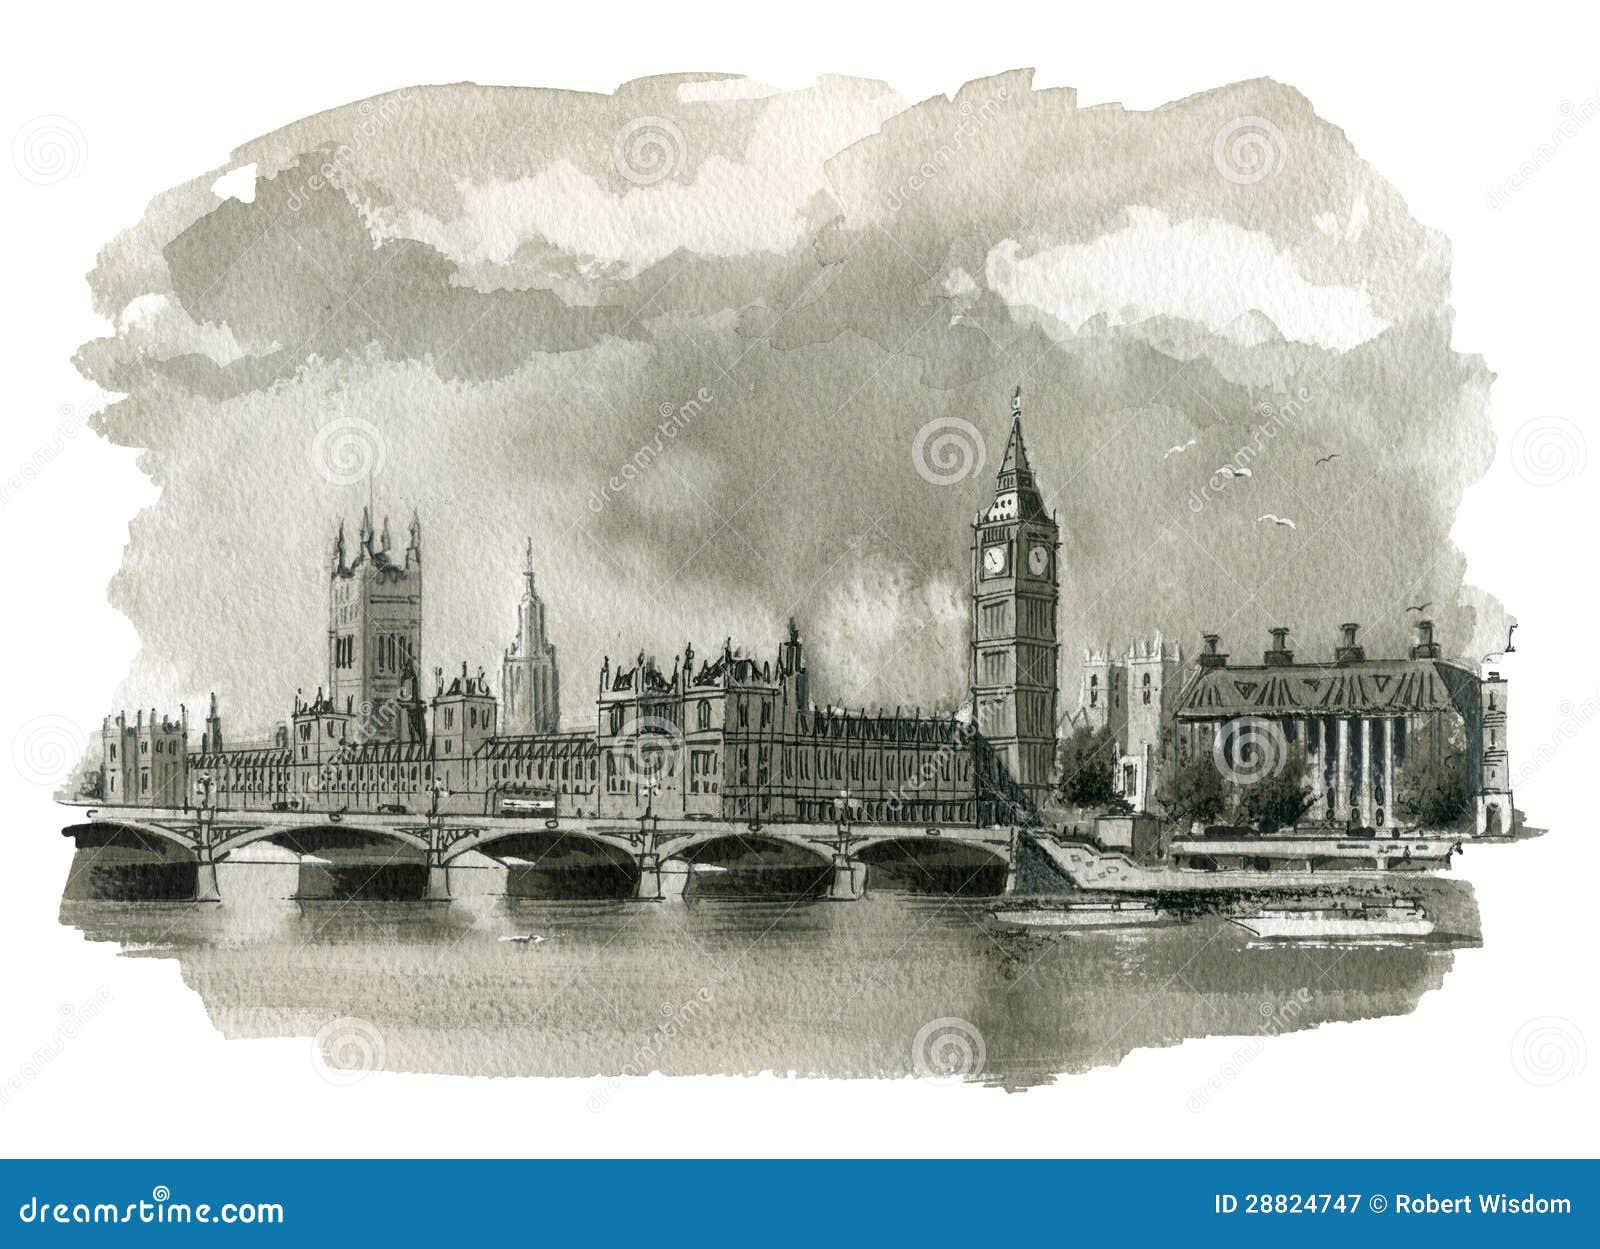 Vector illustration of london city 2 royalty free stock photography - Big Ben Illustration Royalty Free Stock Photography